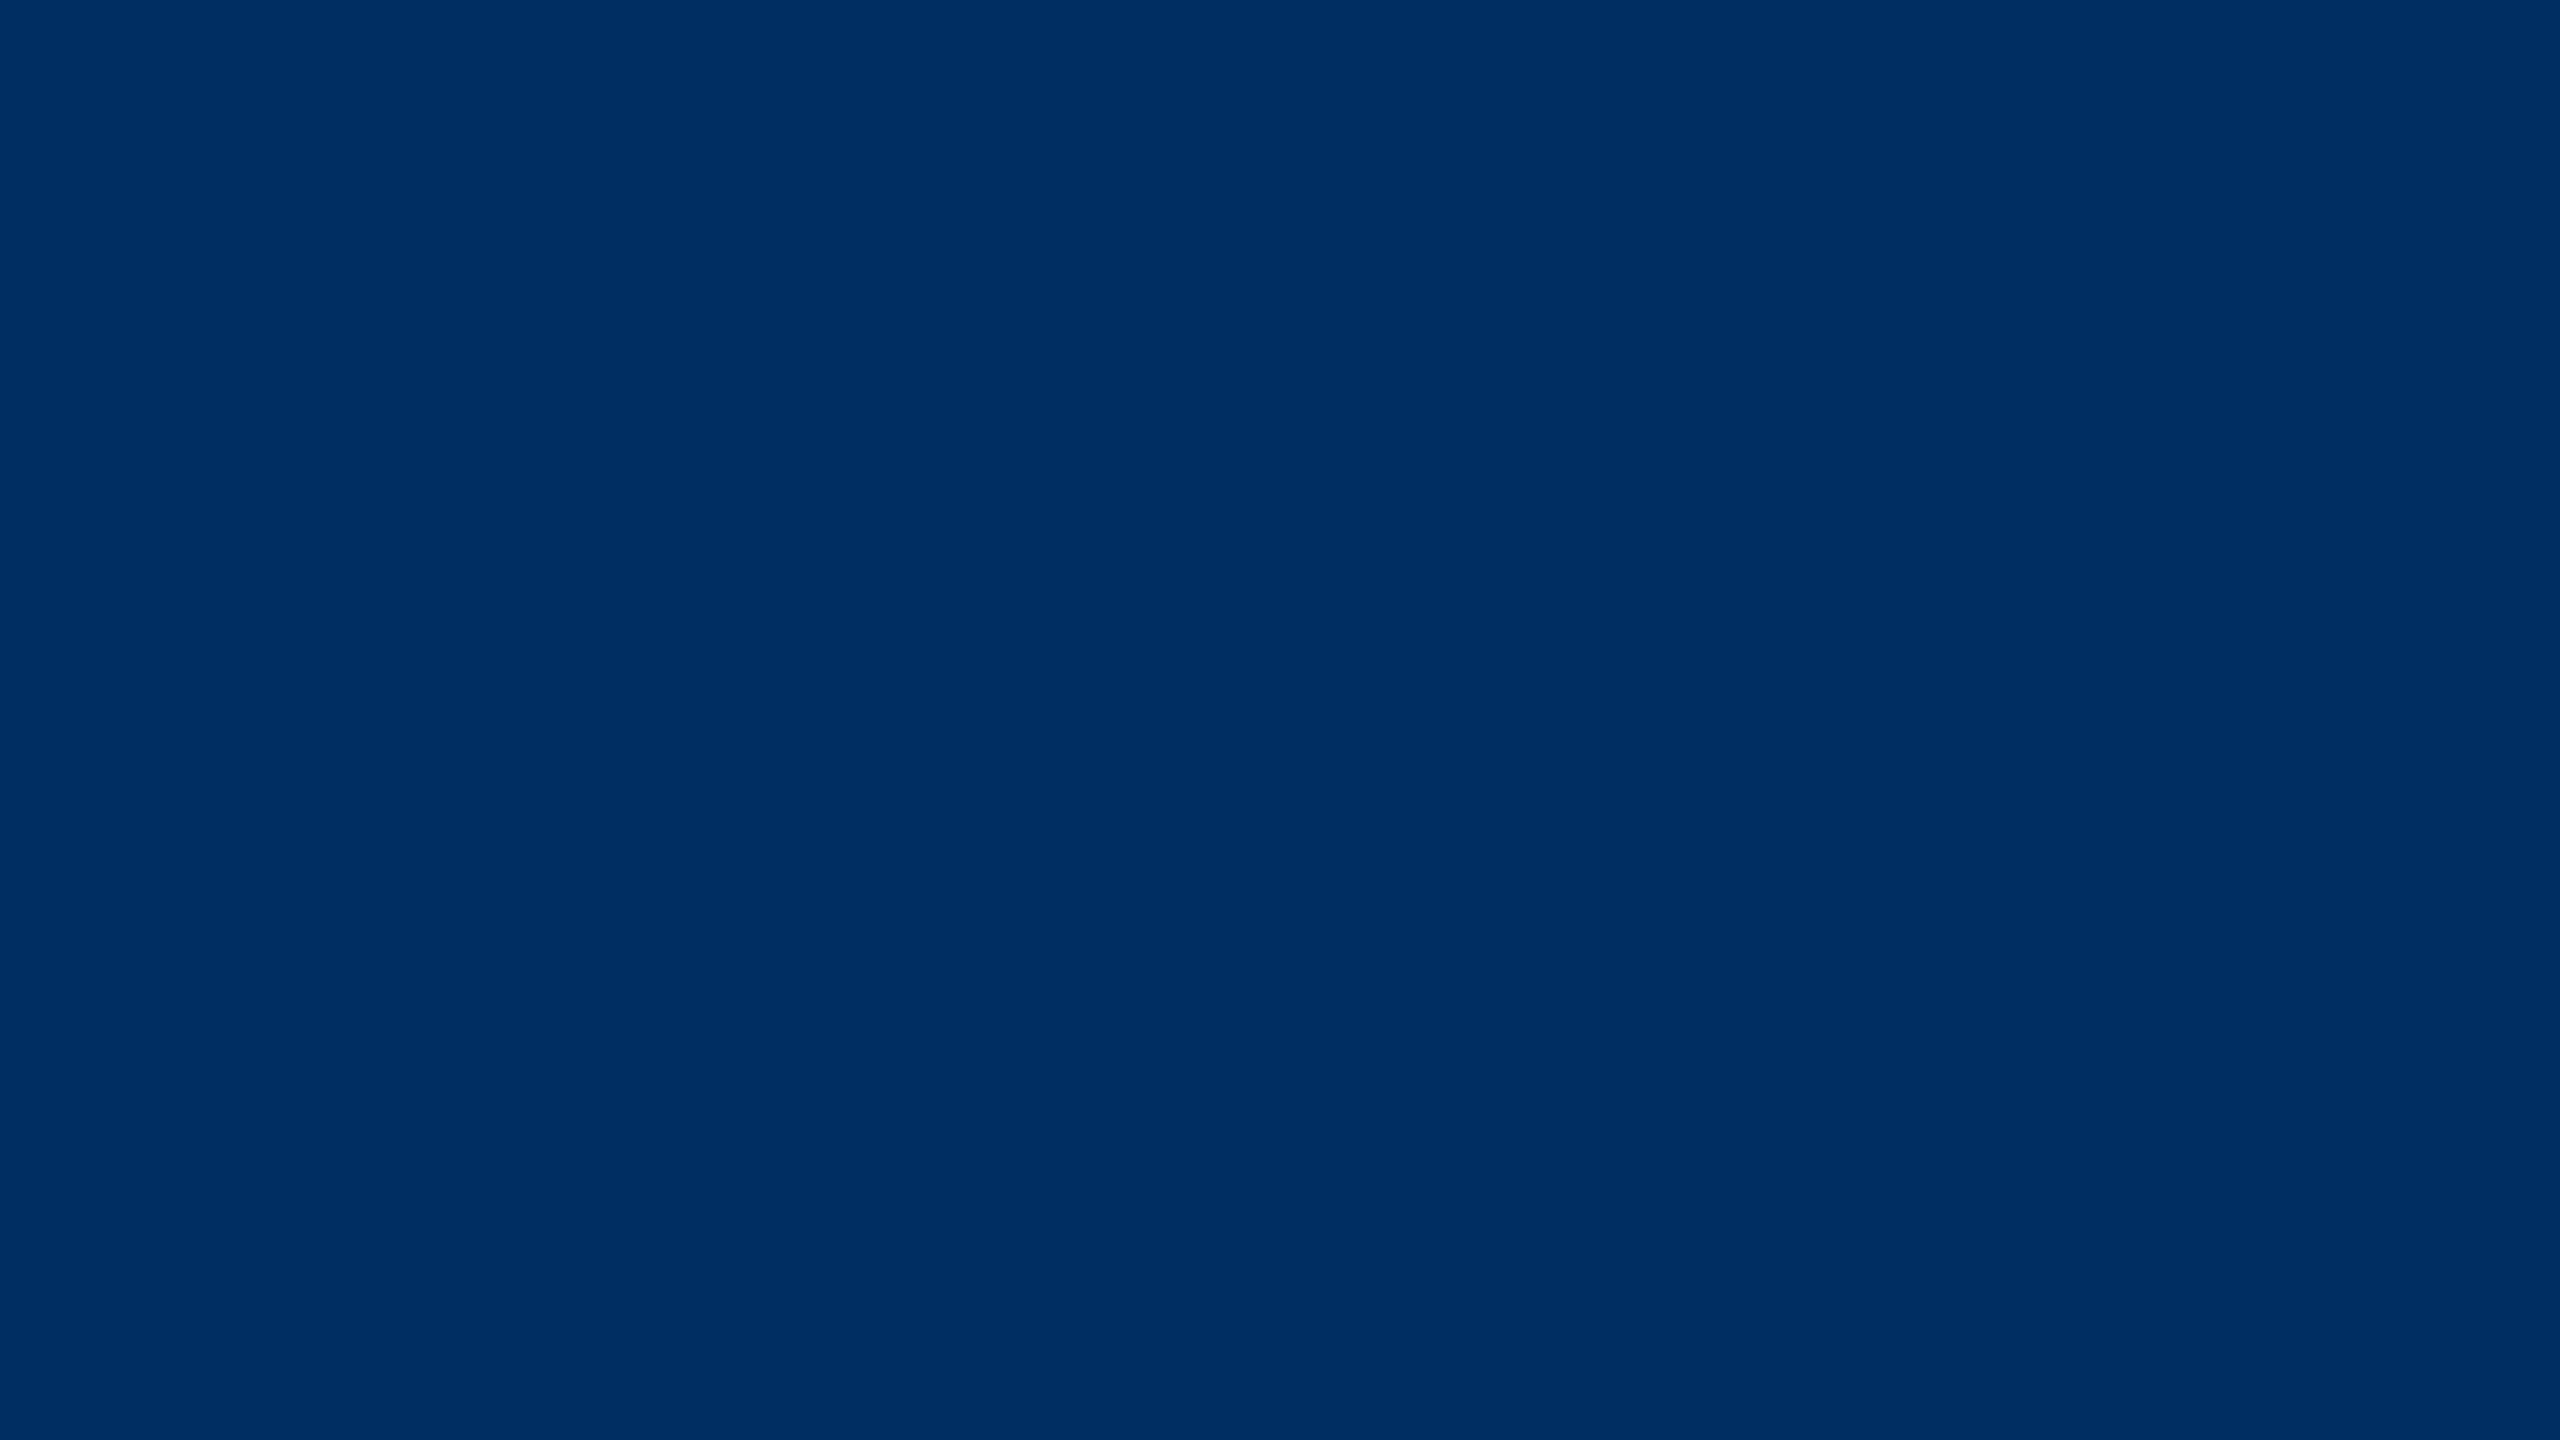 light blue color plain background wwwpixsharkcom